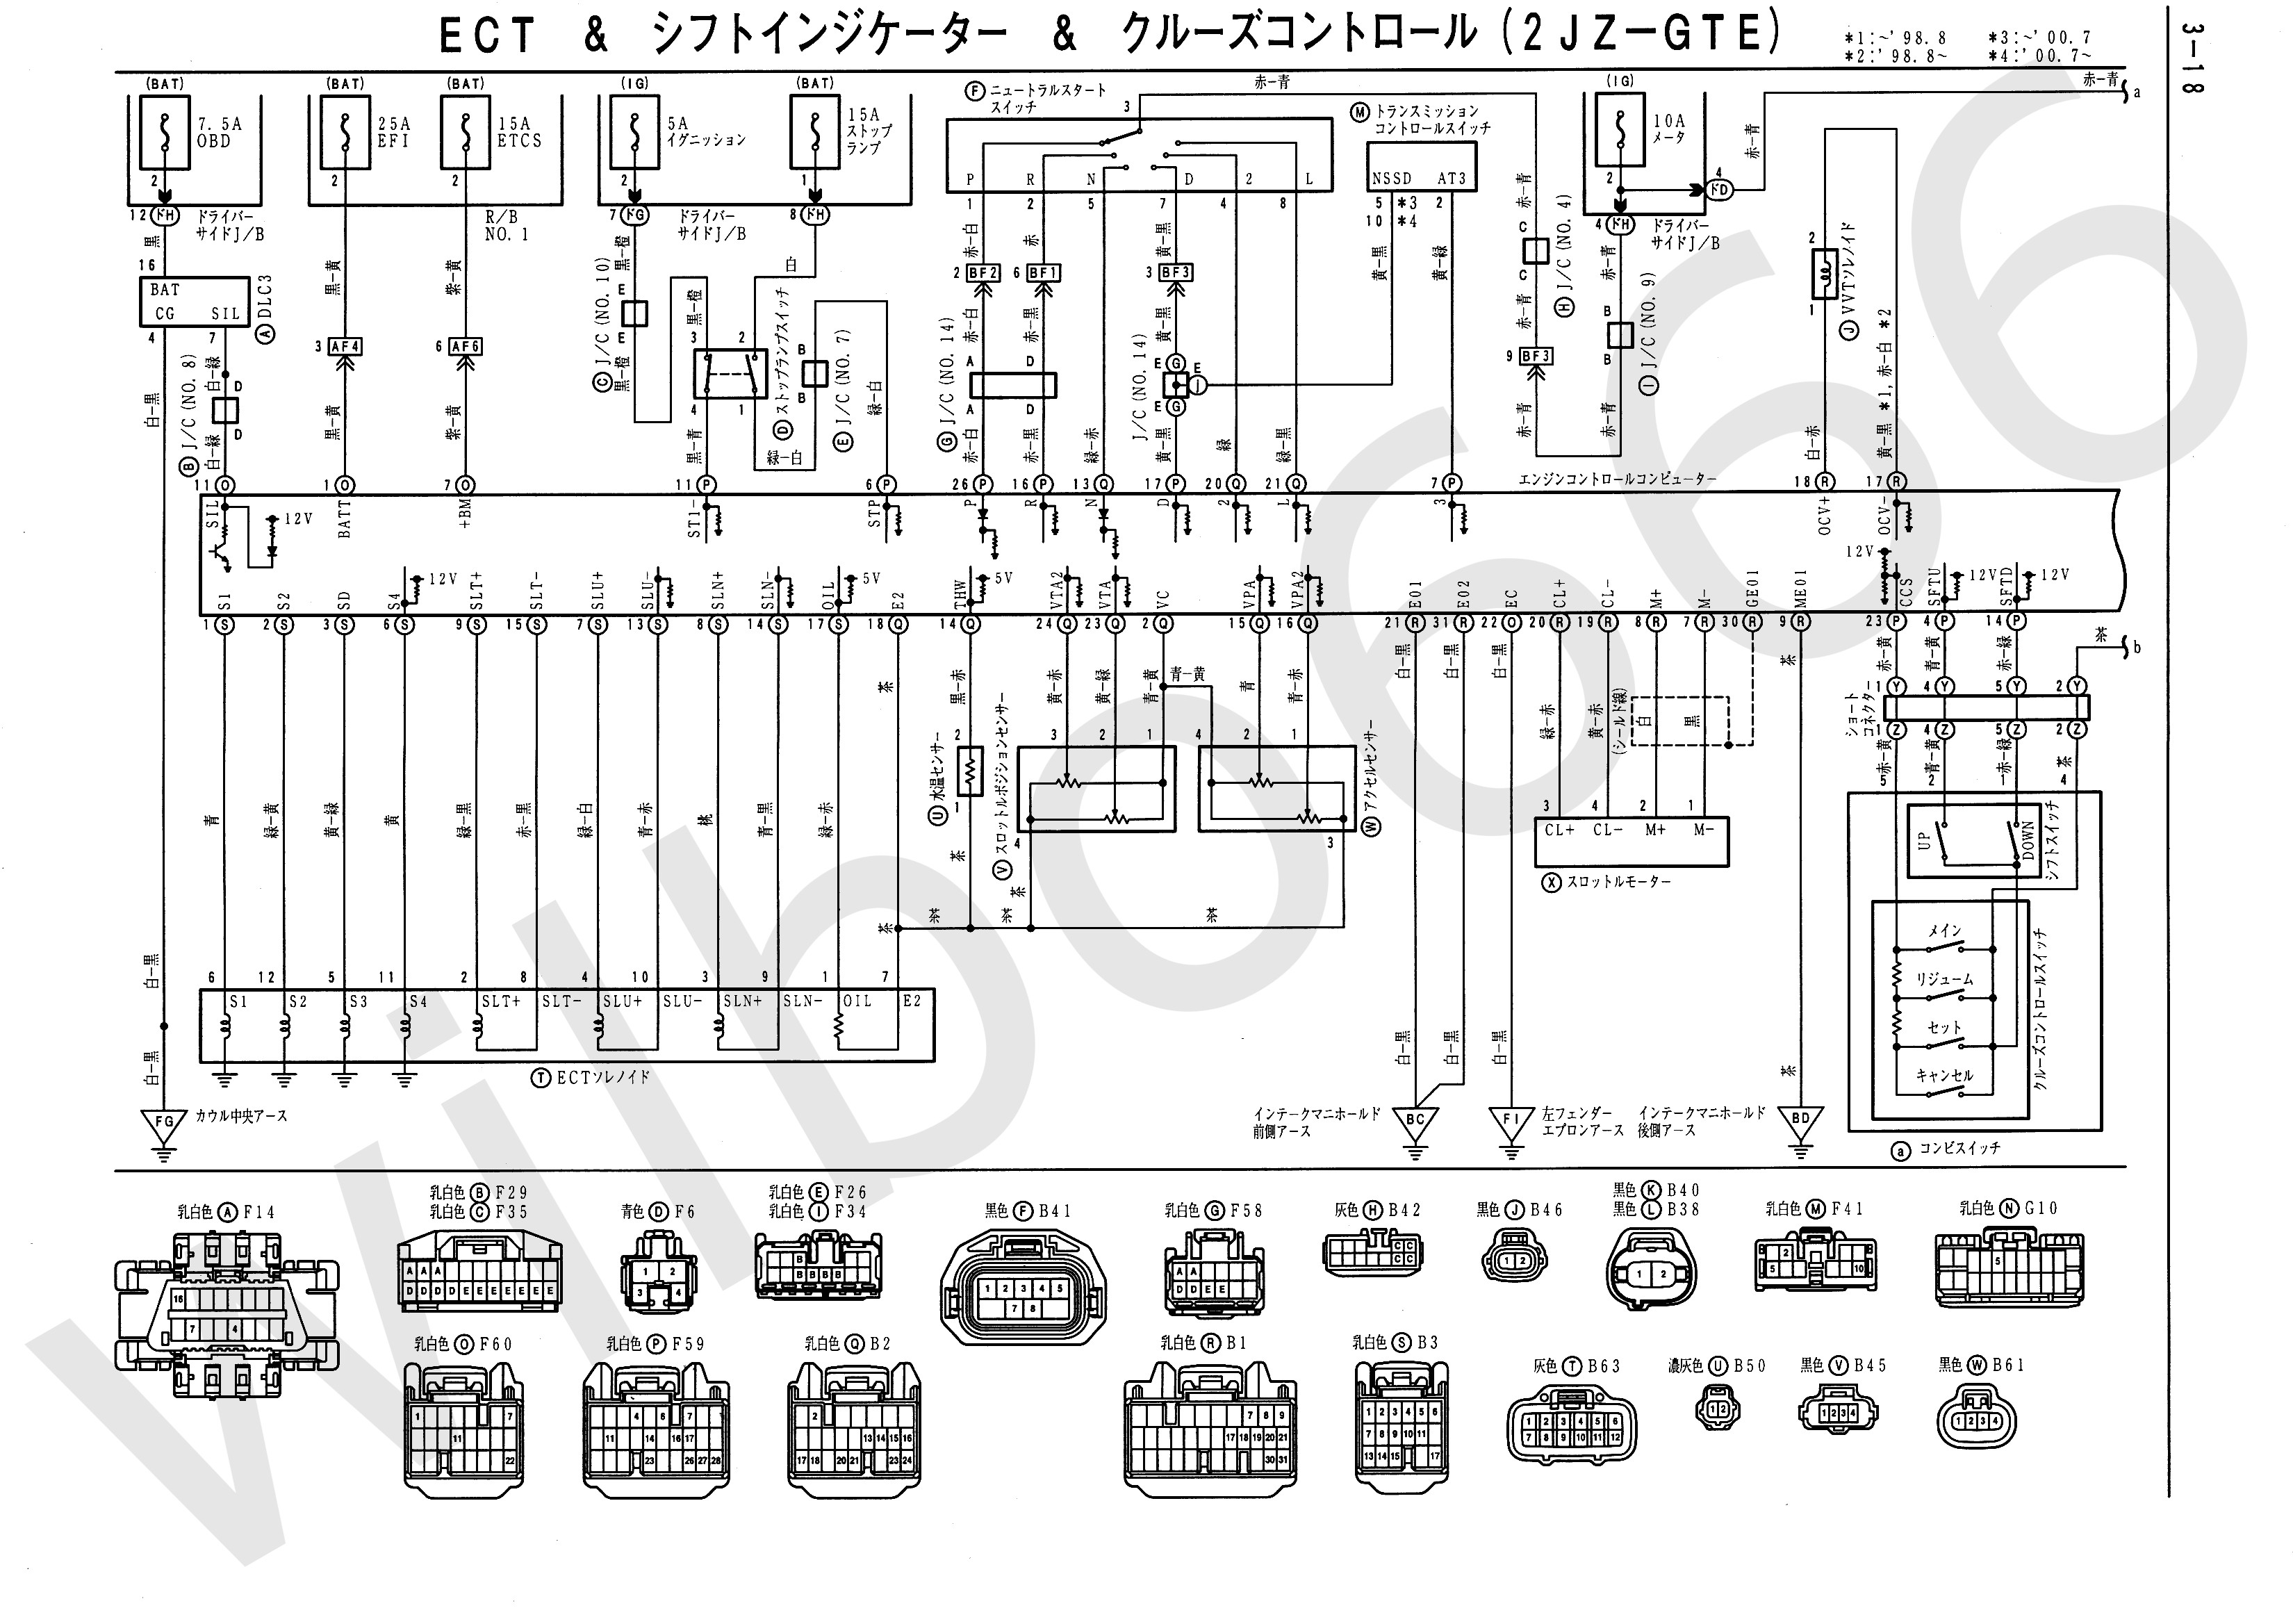 Car Engine Management System Block Diagram Wilbo666 2jz Gte Vvti Jzs161 Aristo Engine Wiring Of Car Engine Management System Block Diagram